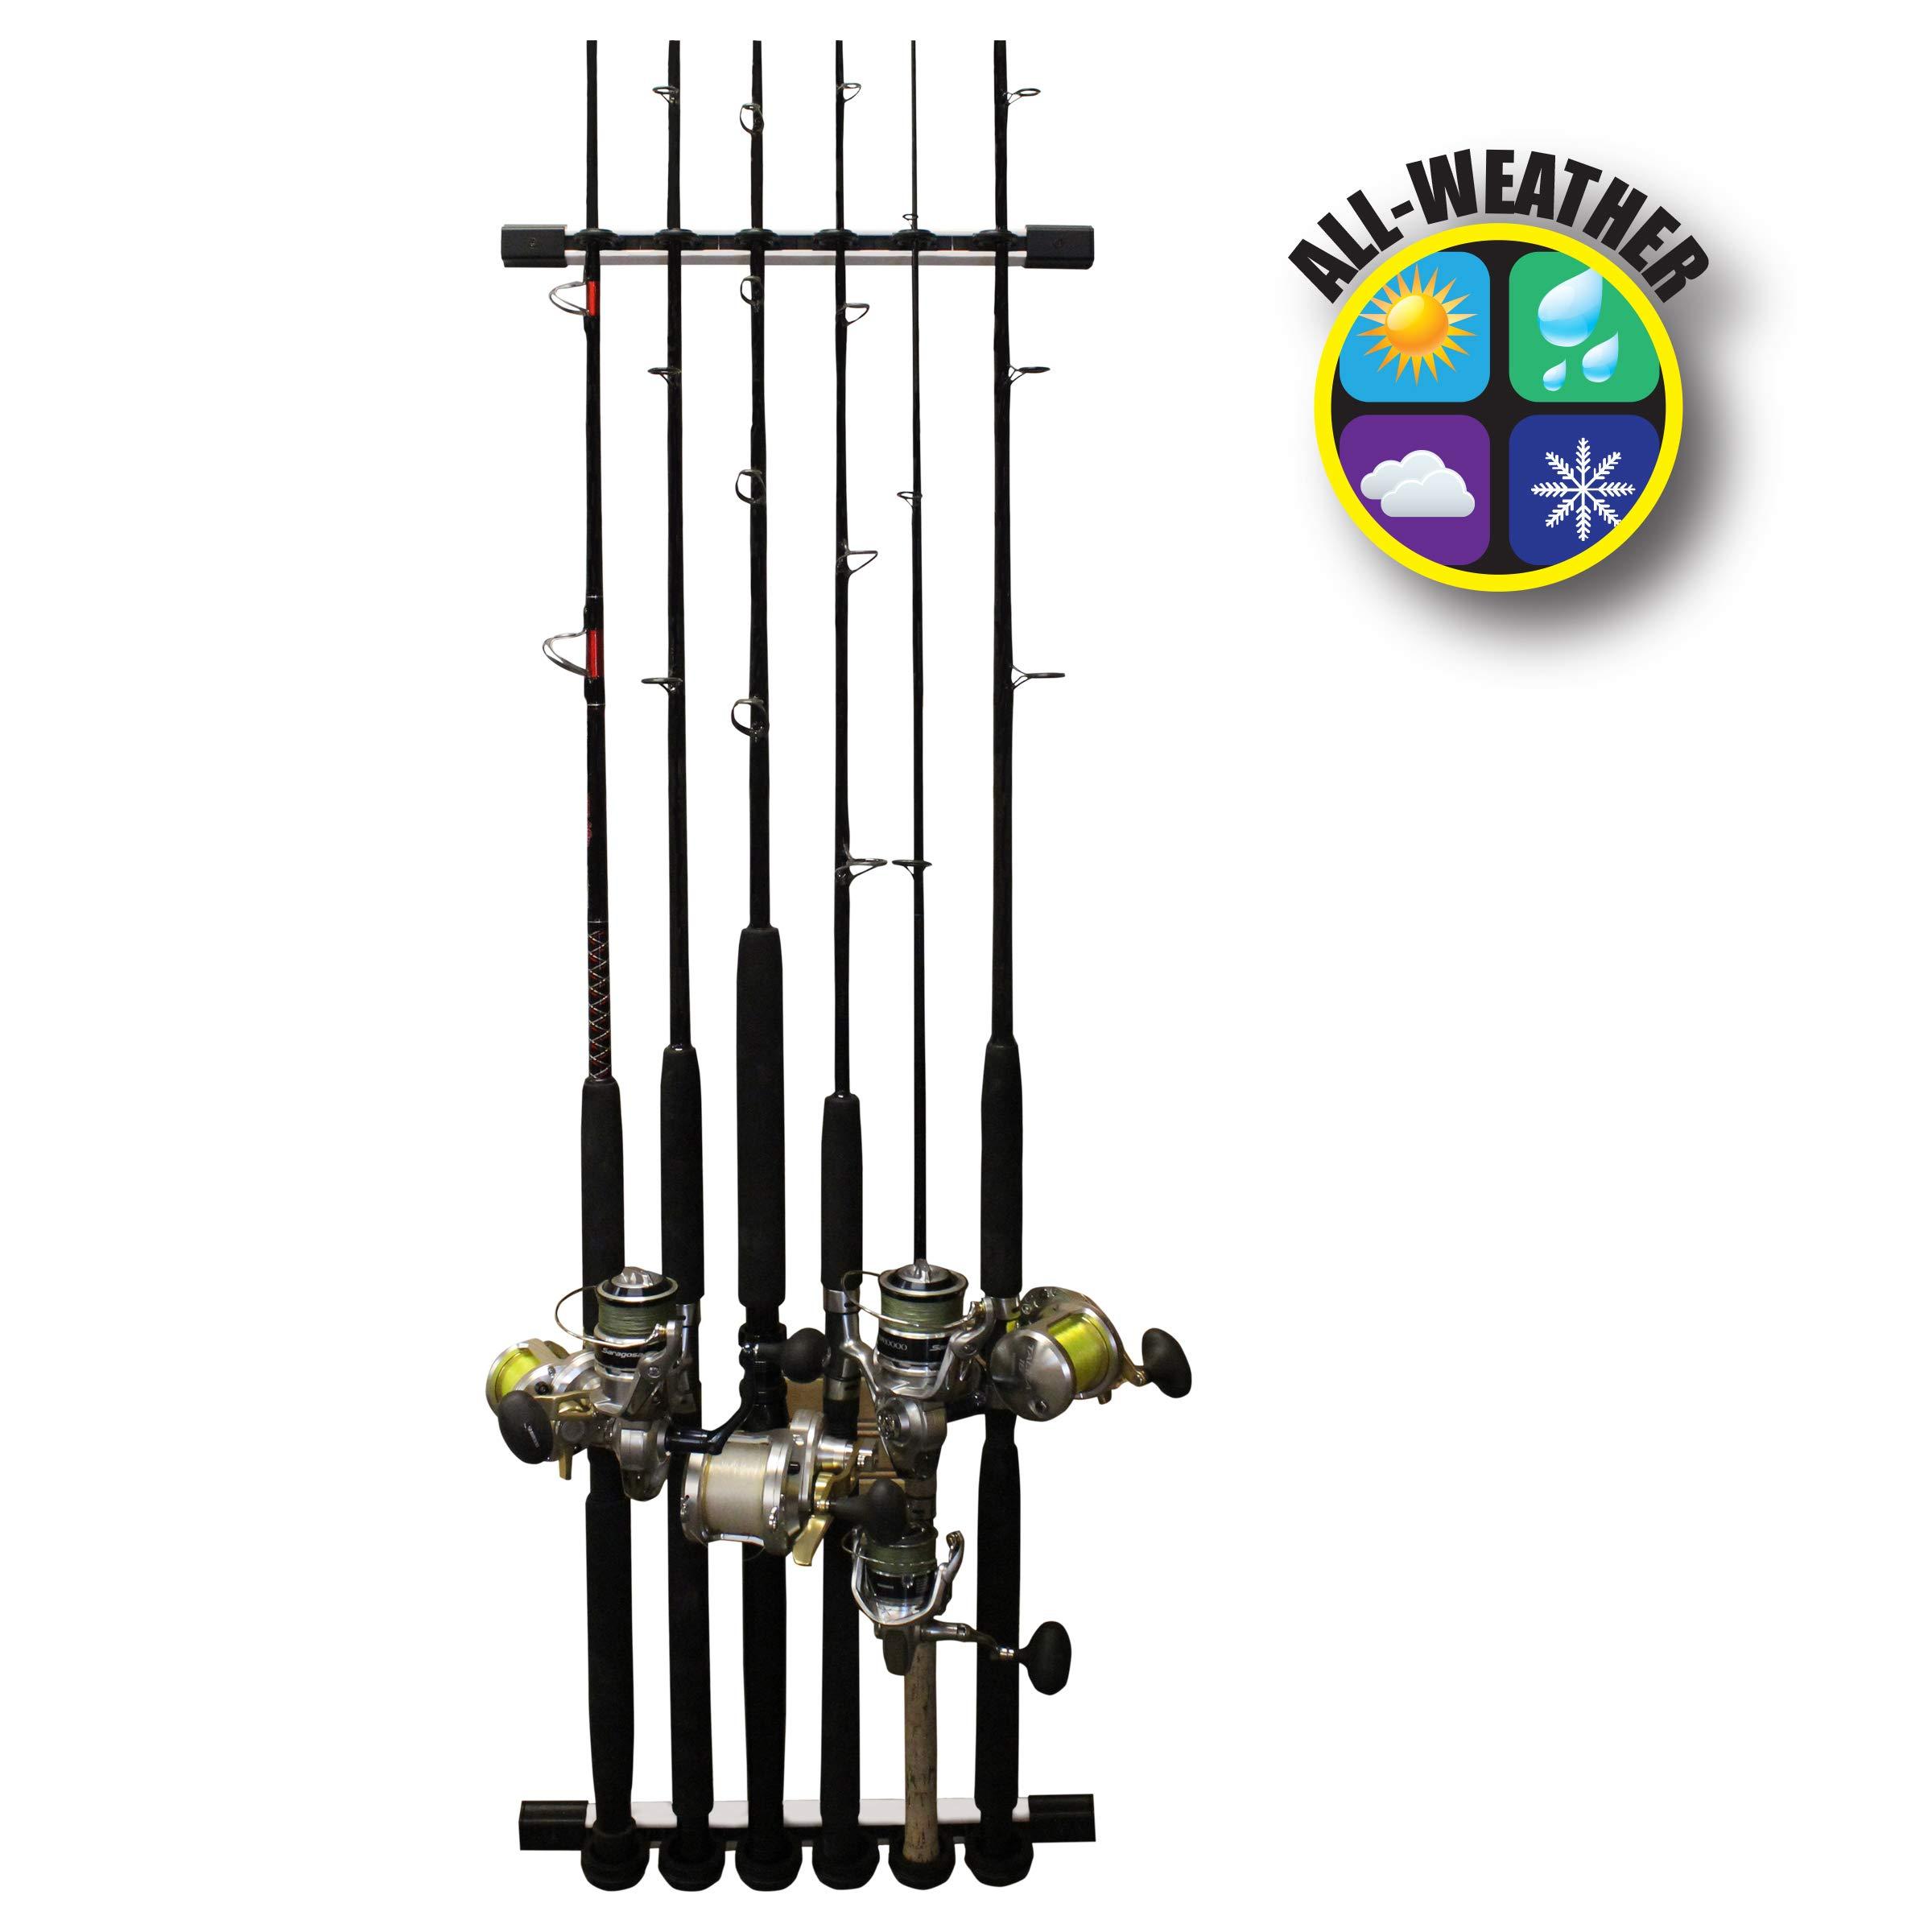 Rush Creek Creations 3 in 1 Fishing Rod/Pole Storage Wall/Ceiling Rack